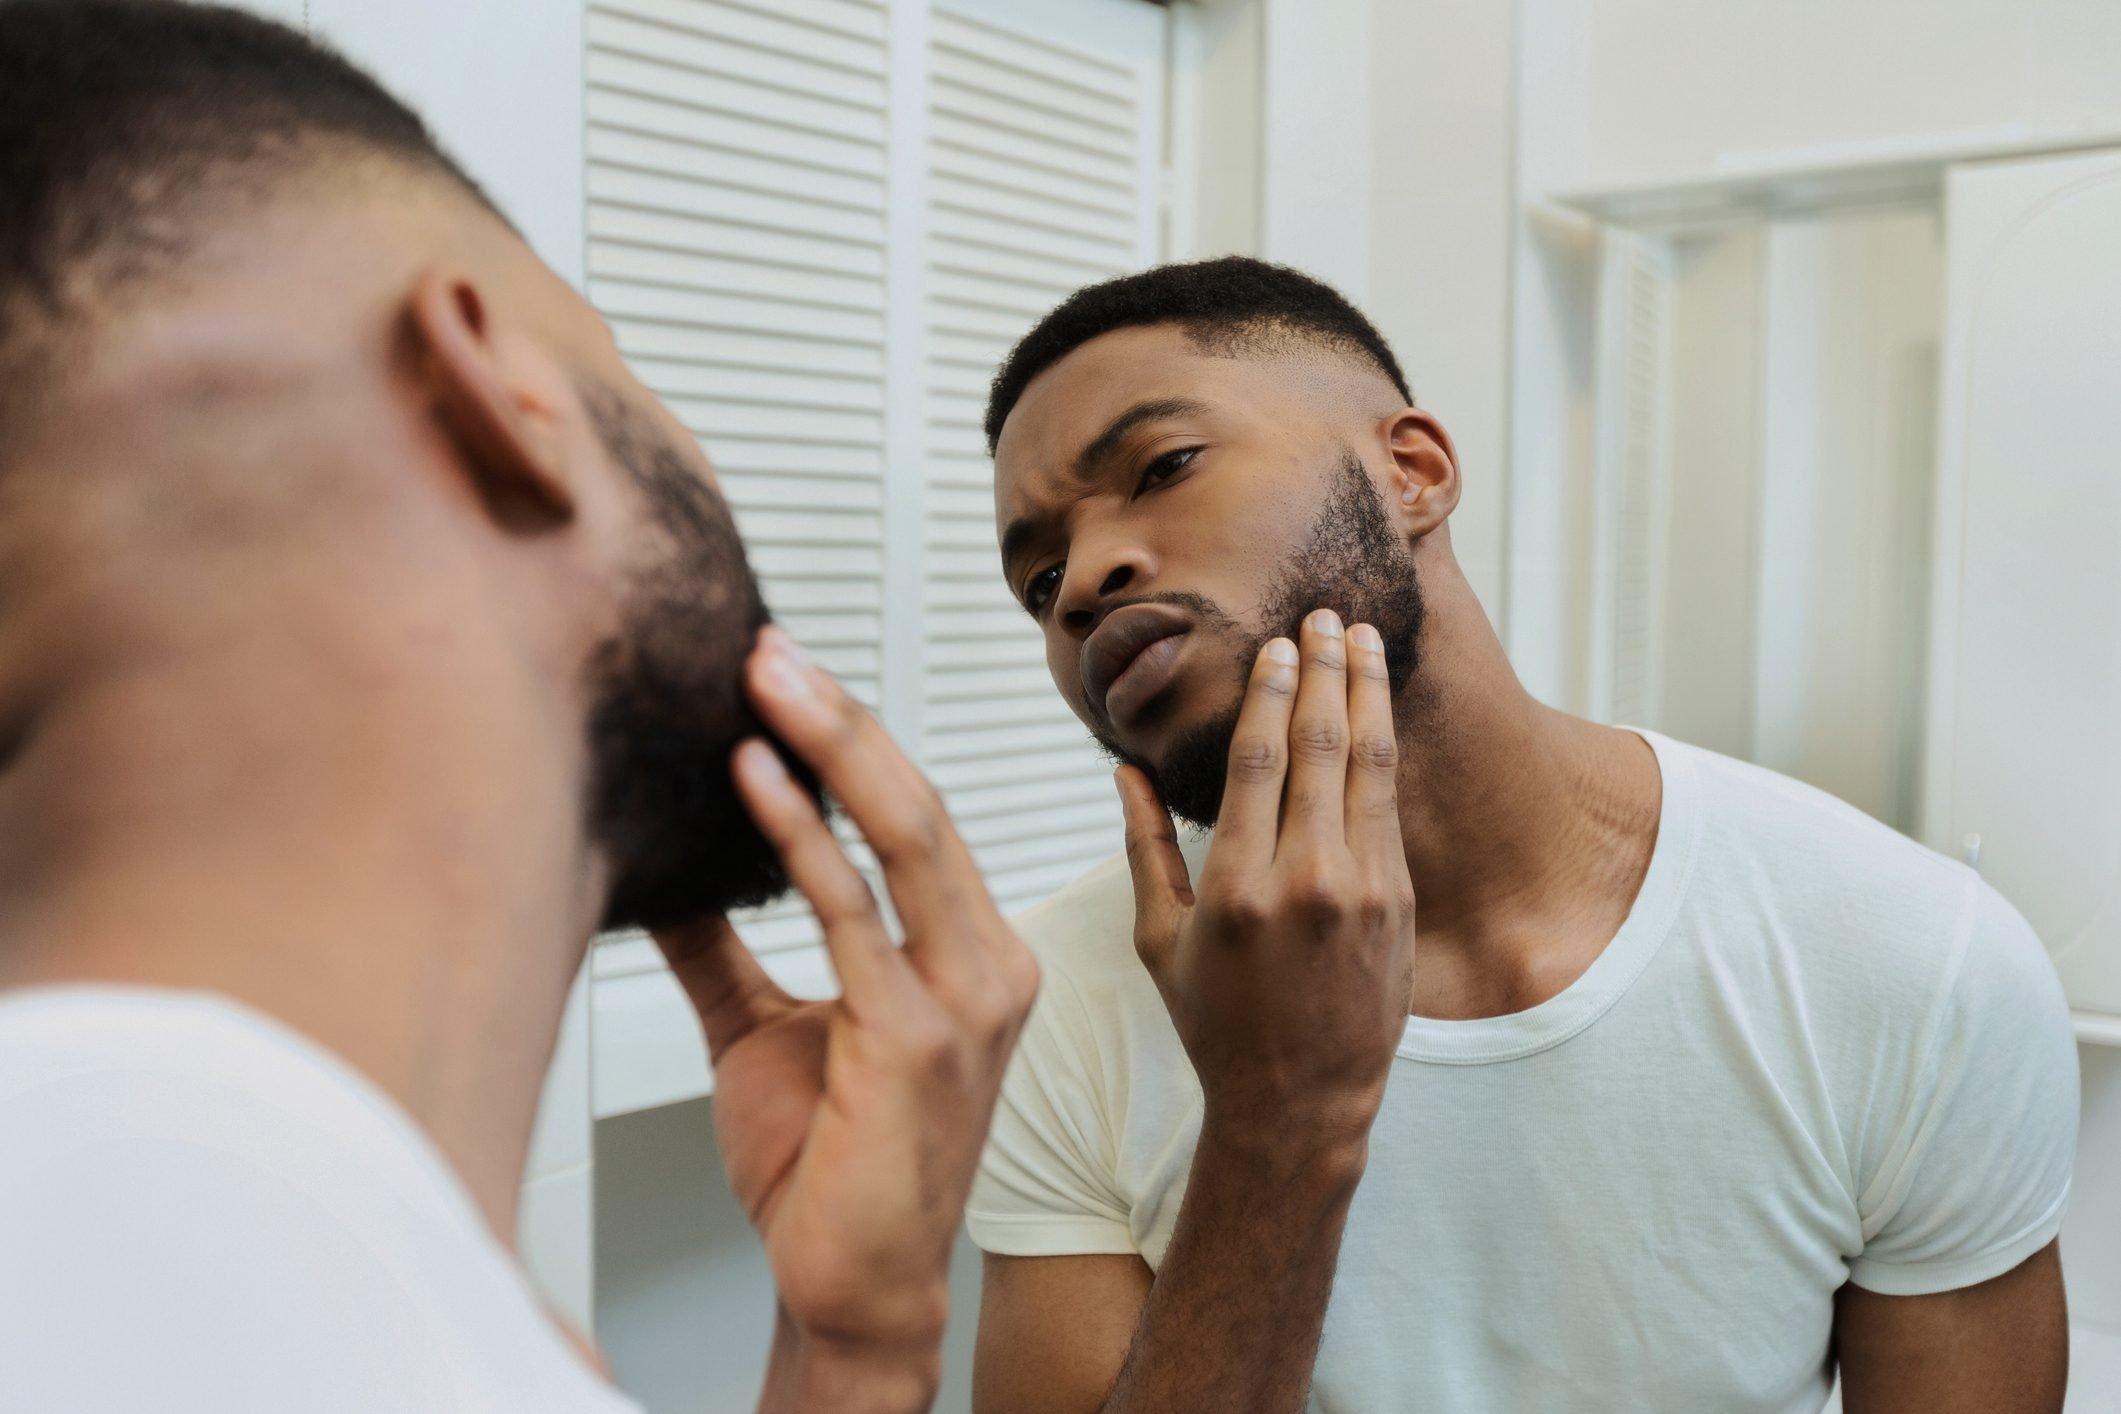 man inspecting beard in mirror